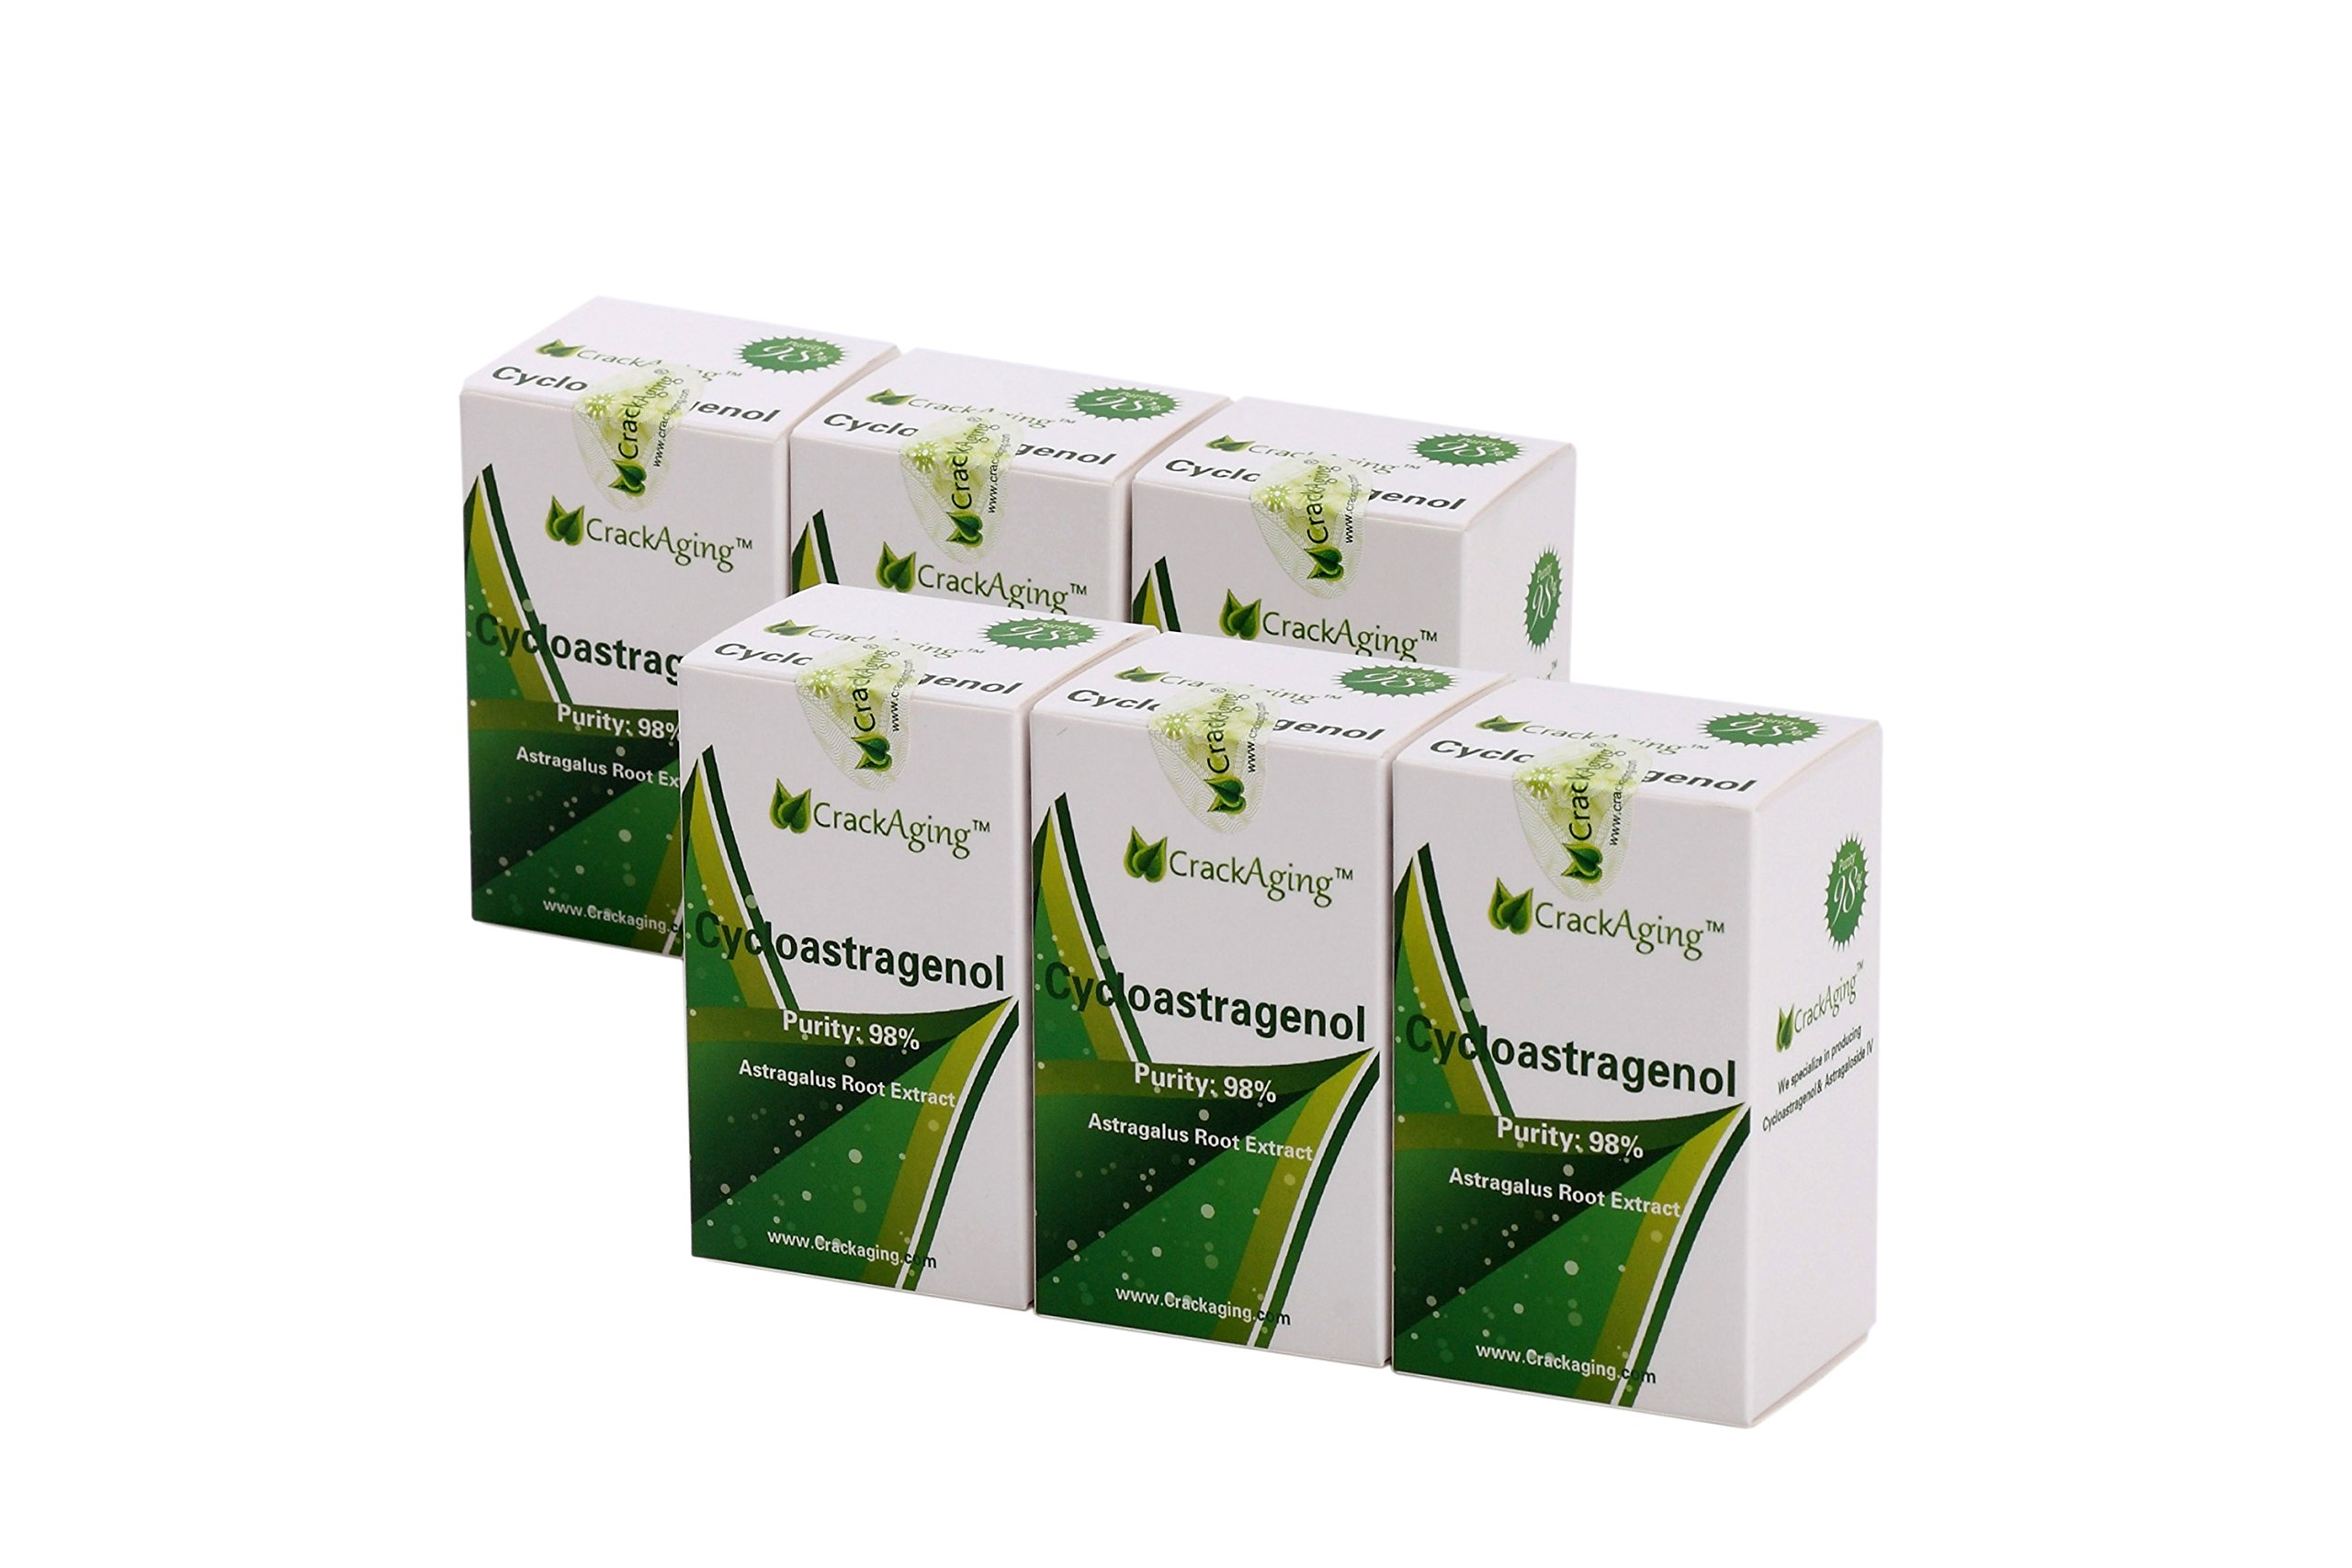 Super-Absorption Cycloastragenol 98% (25mg/Cap, 180 Caps in 6 Bottles)